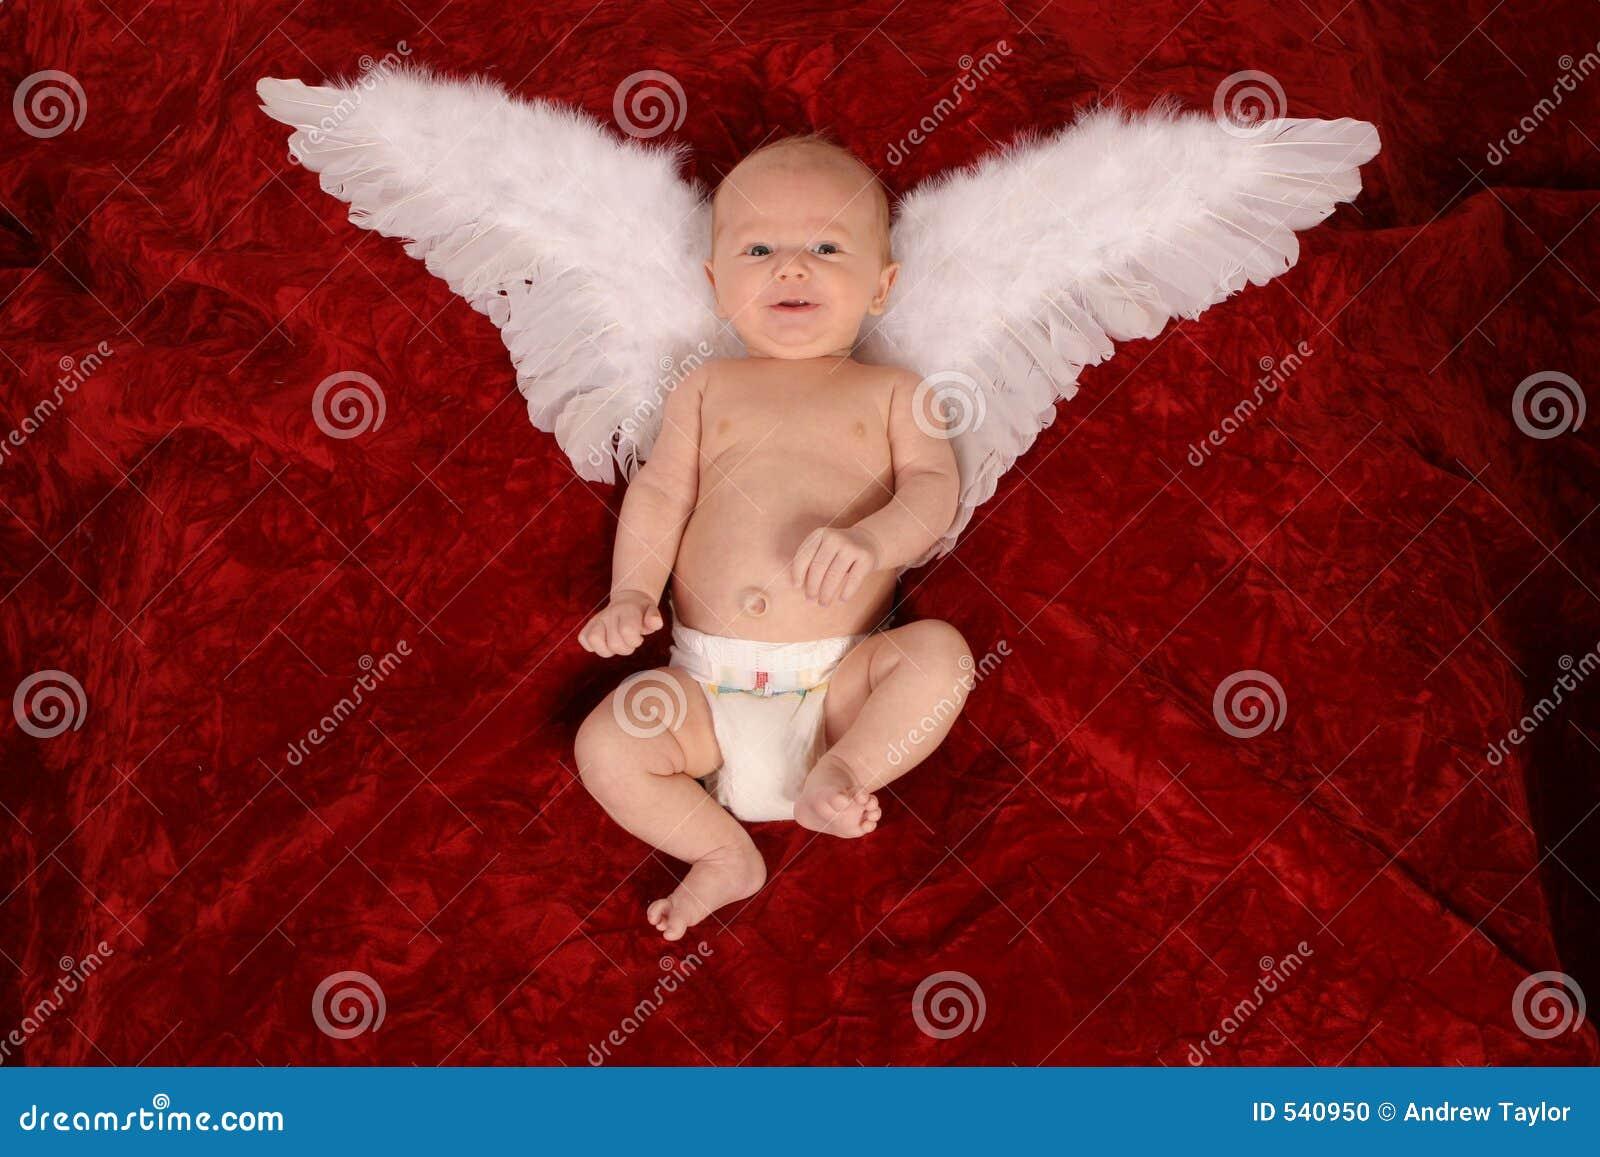 Download 新出生的天使 库存照片. 图片 包括有 受影响, 表面, 华伦泰, 逗人喜爱, 男朋友, 新出生, 概念, 白种人 - 540950